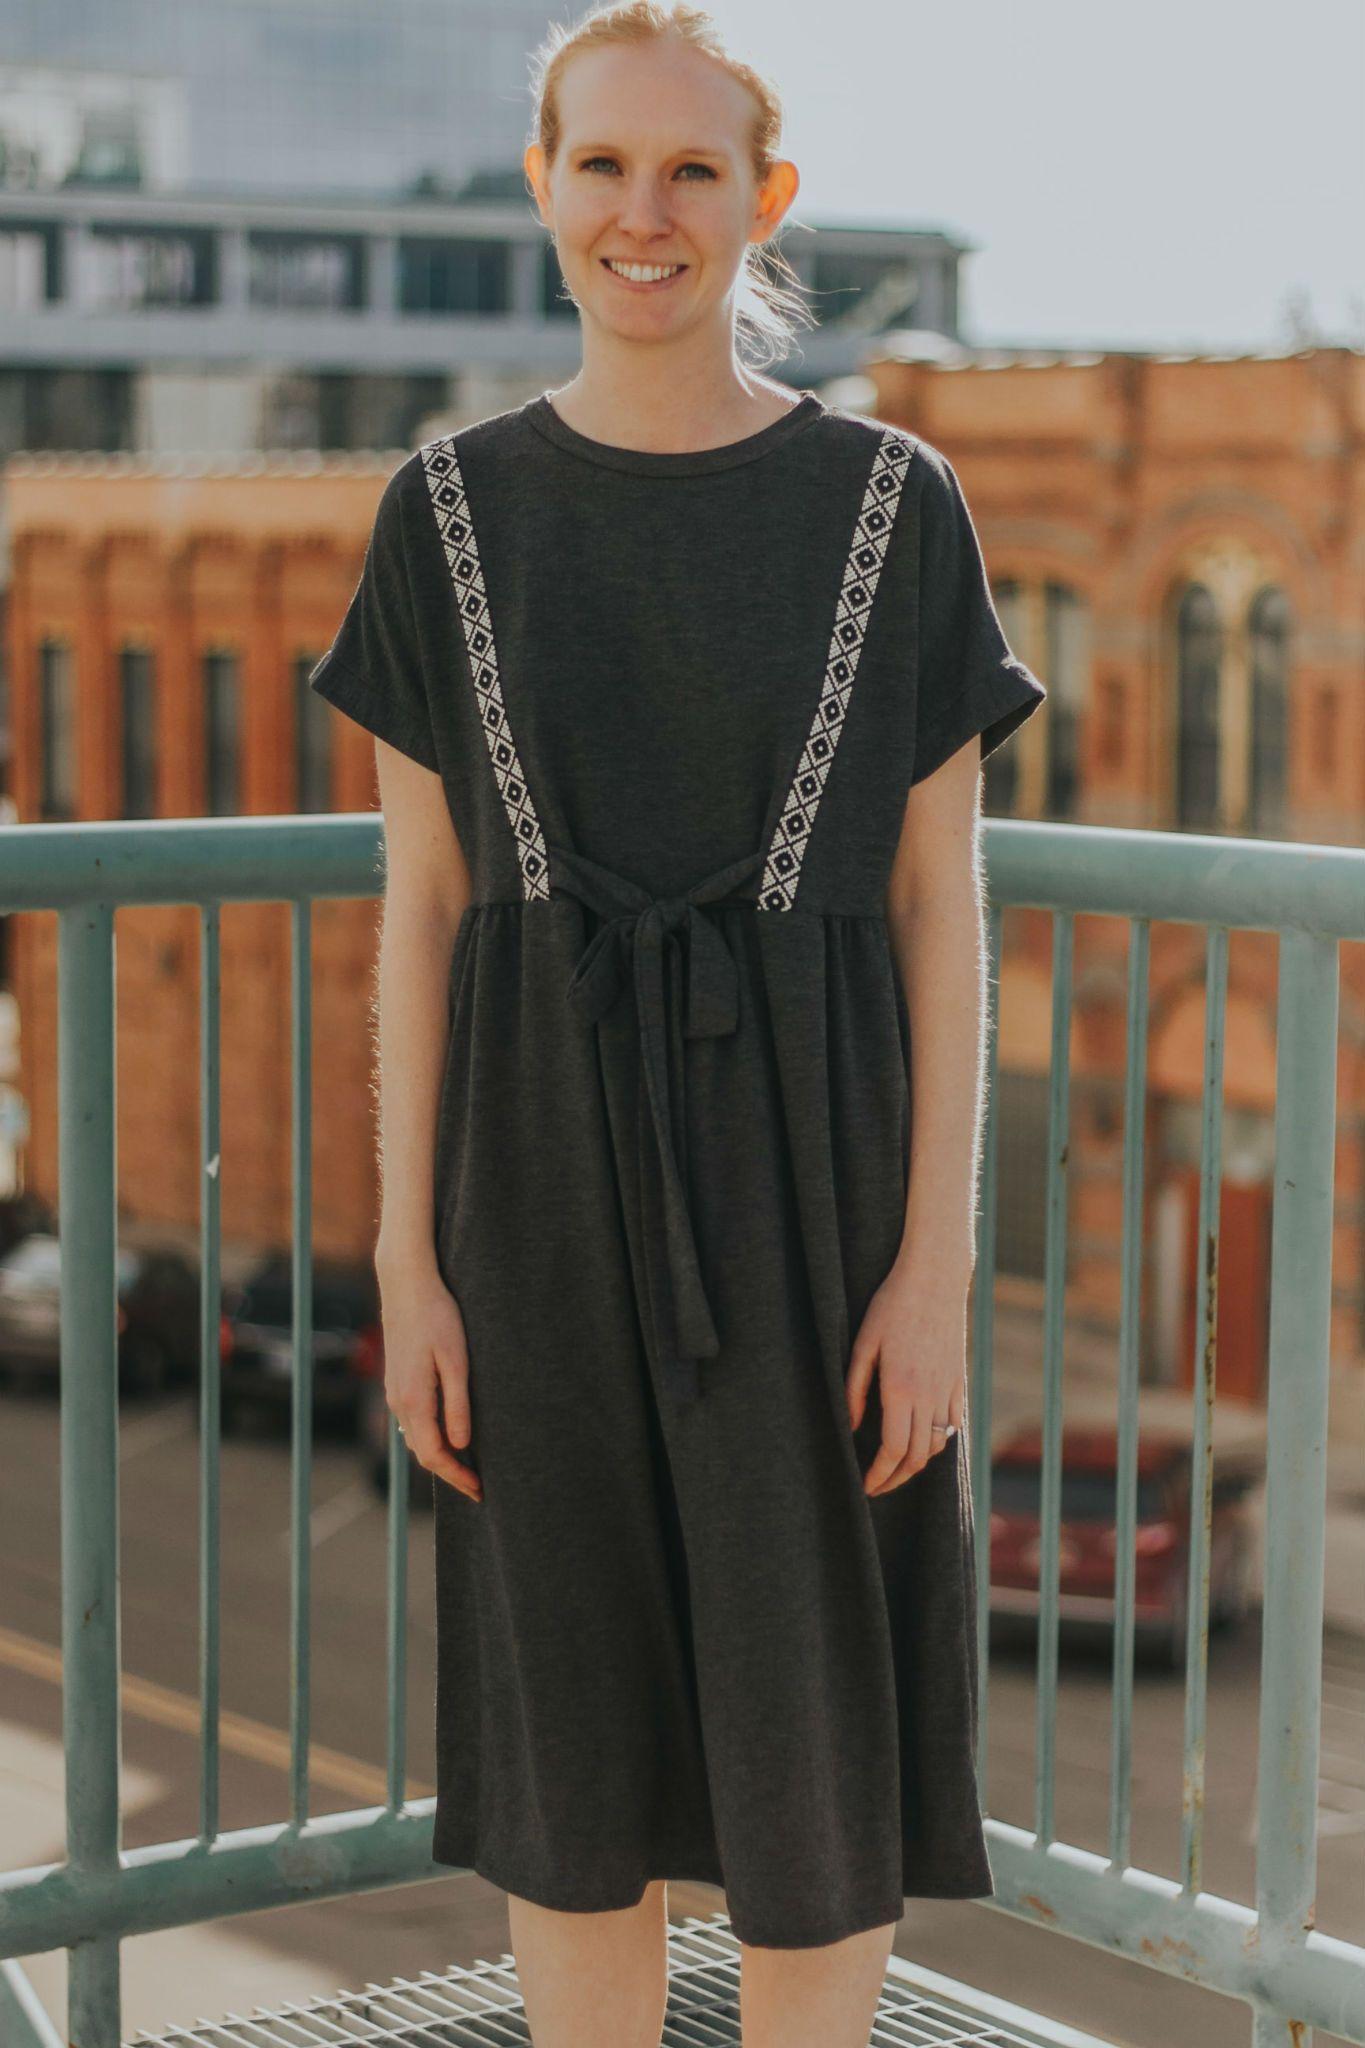 f0db5a97134 Toronto Embroidered Dress - CLEO MADISON